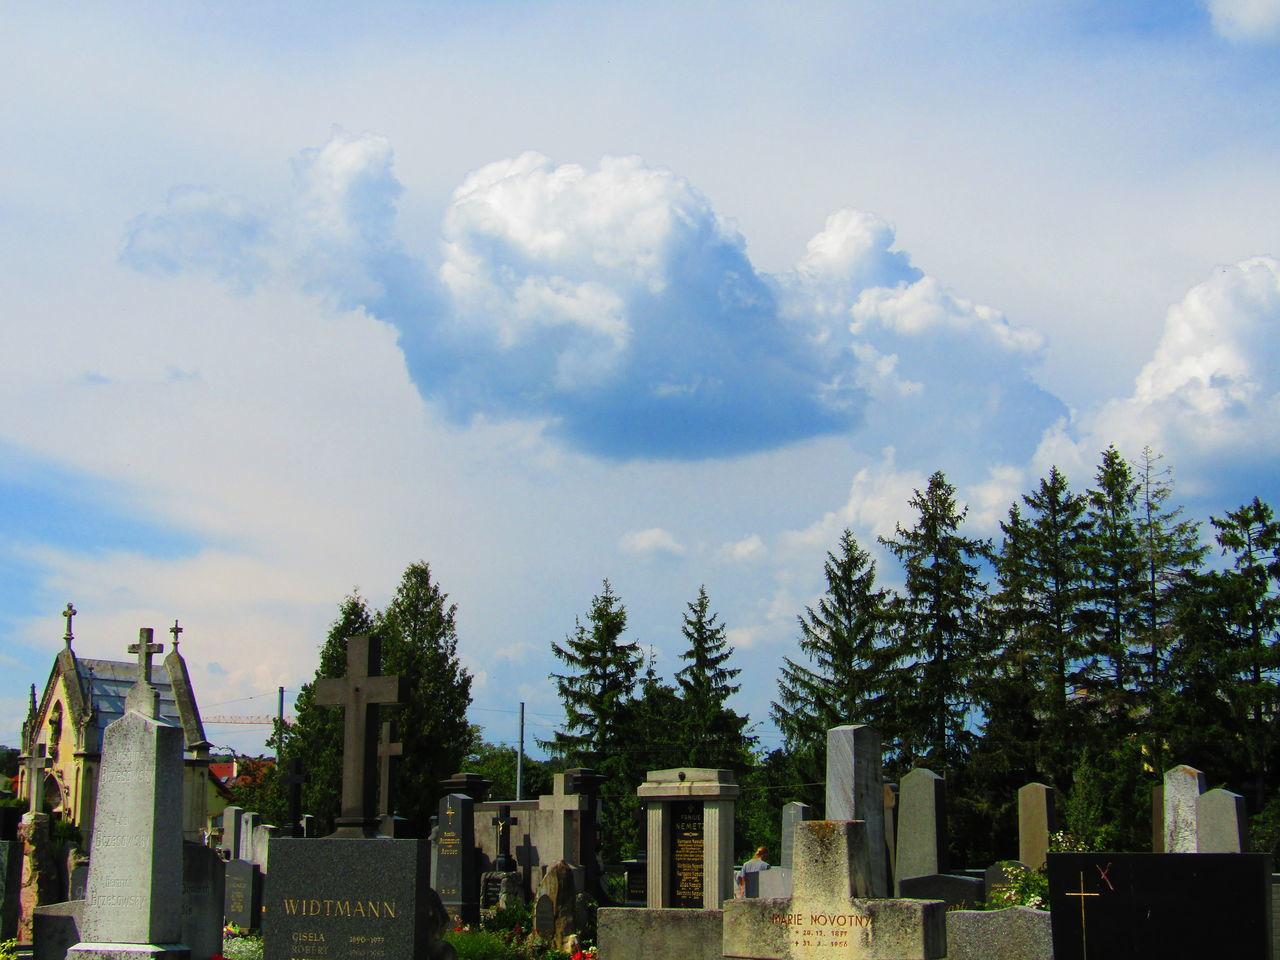 Liesing Rodaun Vienna Austria Friedhof Cloud - Sky Memorial Cemetery Tombstone Wien